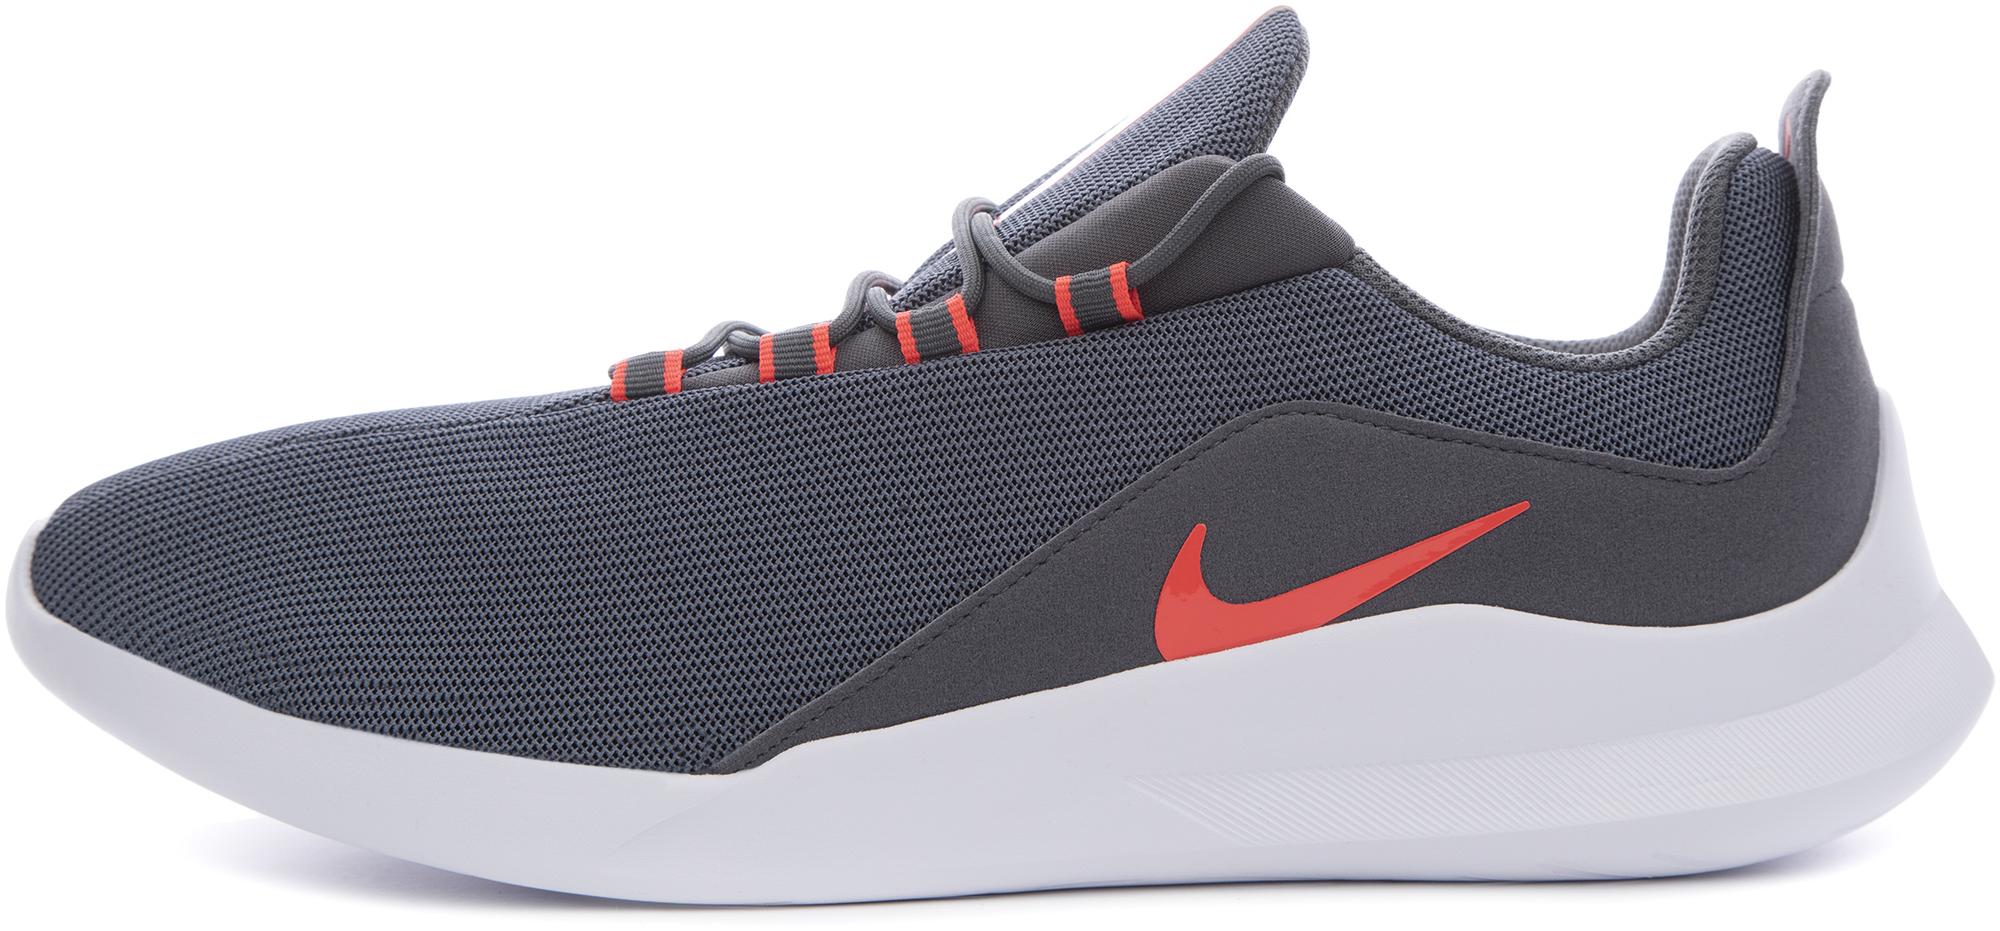 Nike Кроссовки мужские Nike Viale, размер 42